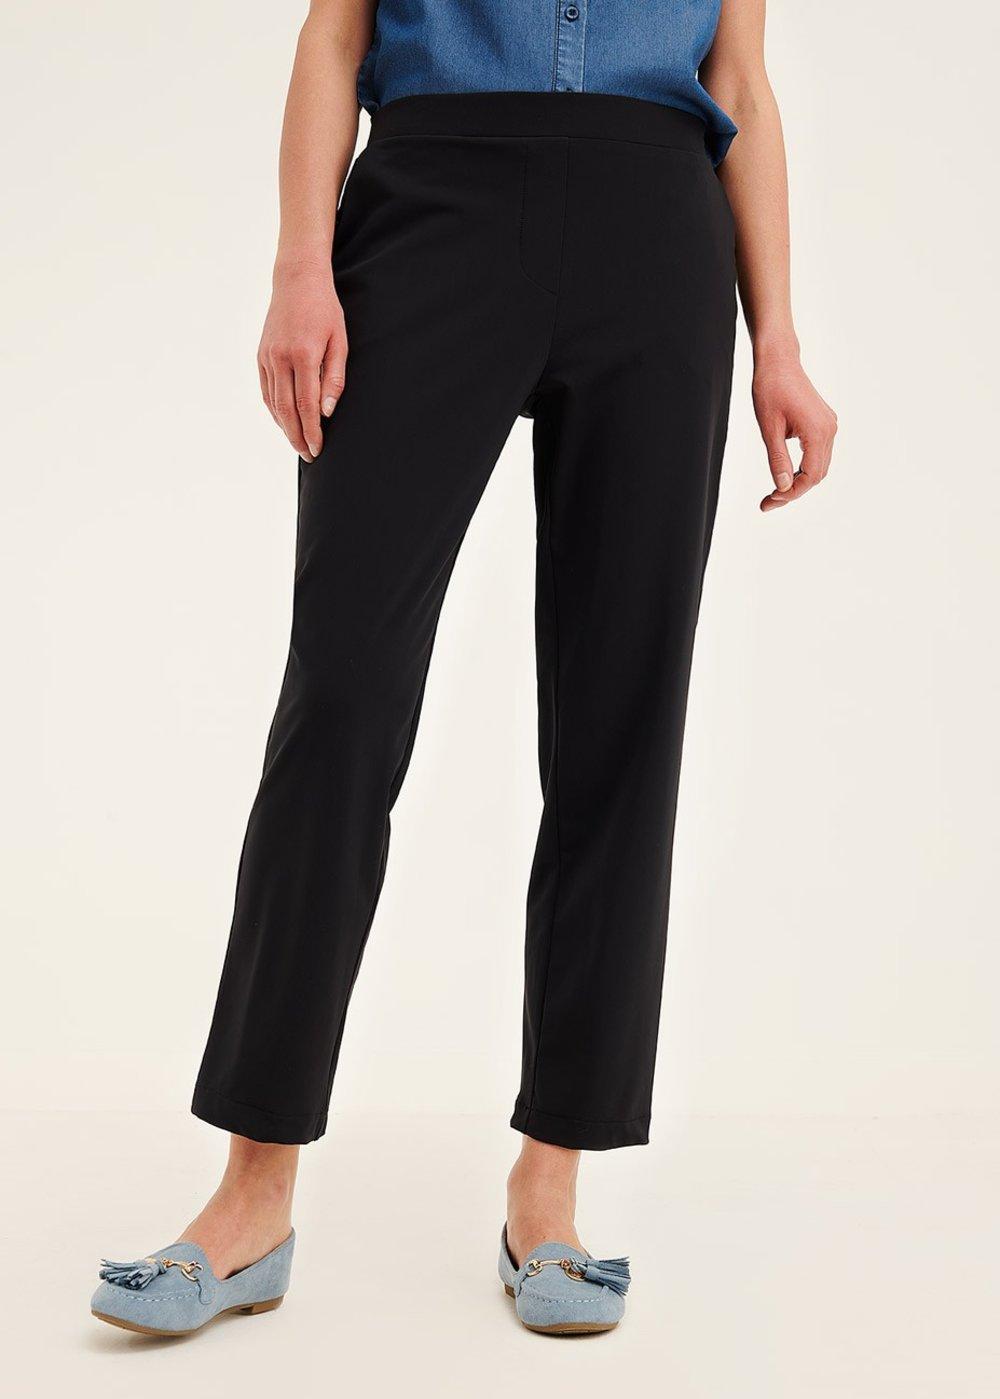 Pantalone elastico Cara tessuto tecnico - Black - Donna